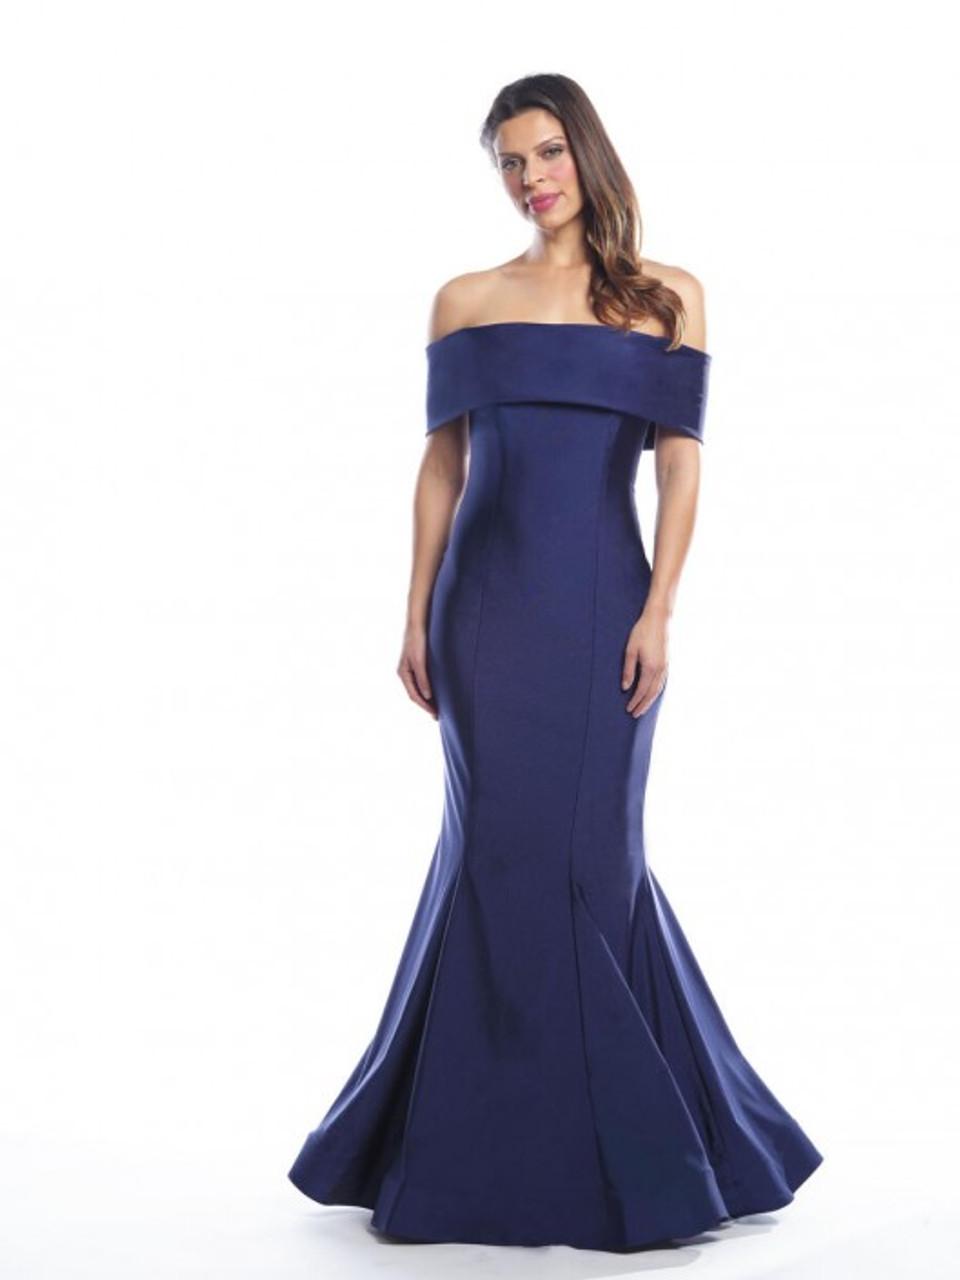 Bari Jay 2065 Off Shoulder Mermaid Bridesmaid Dress